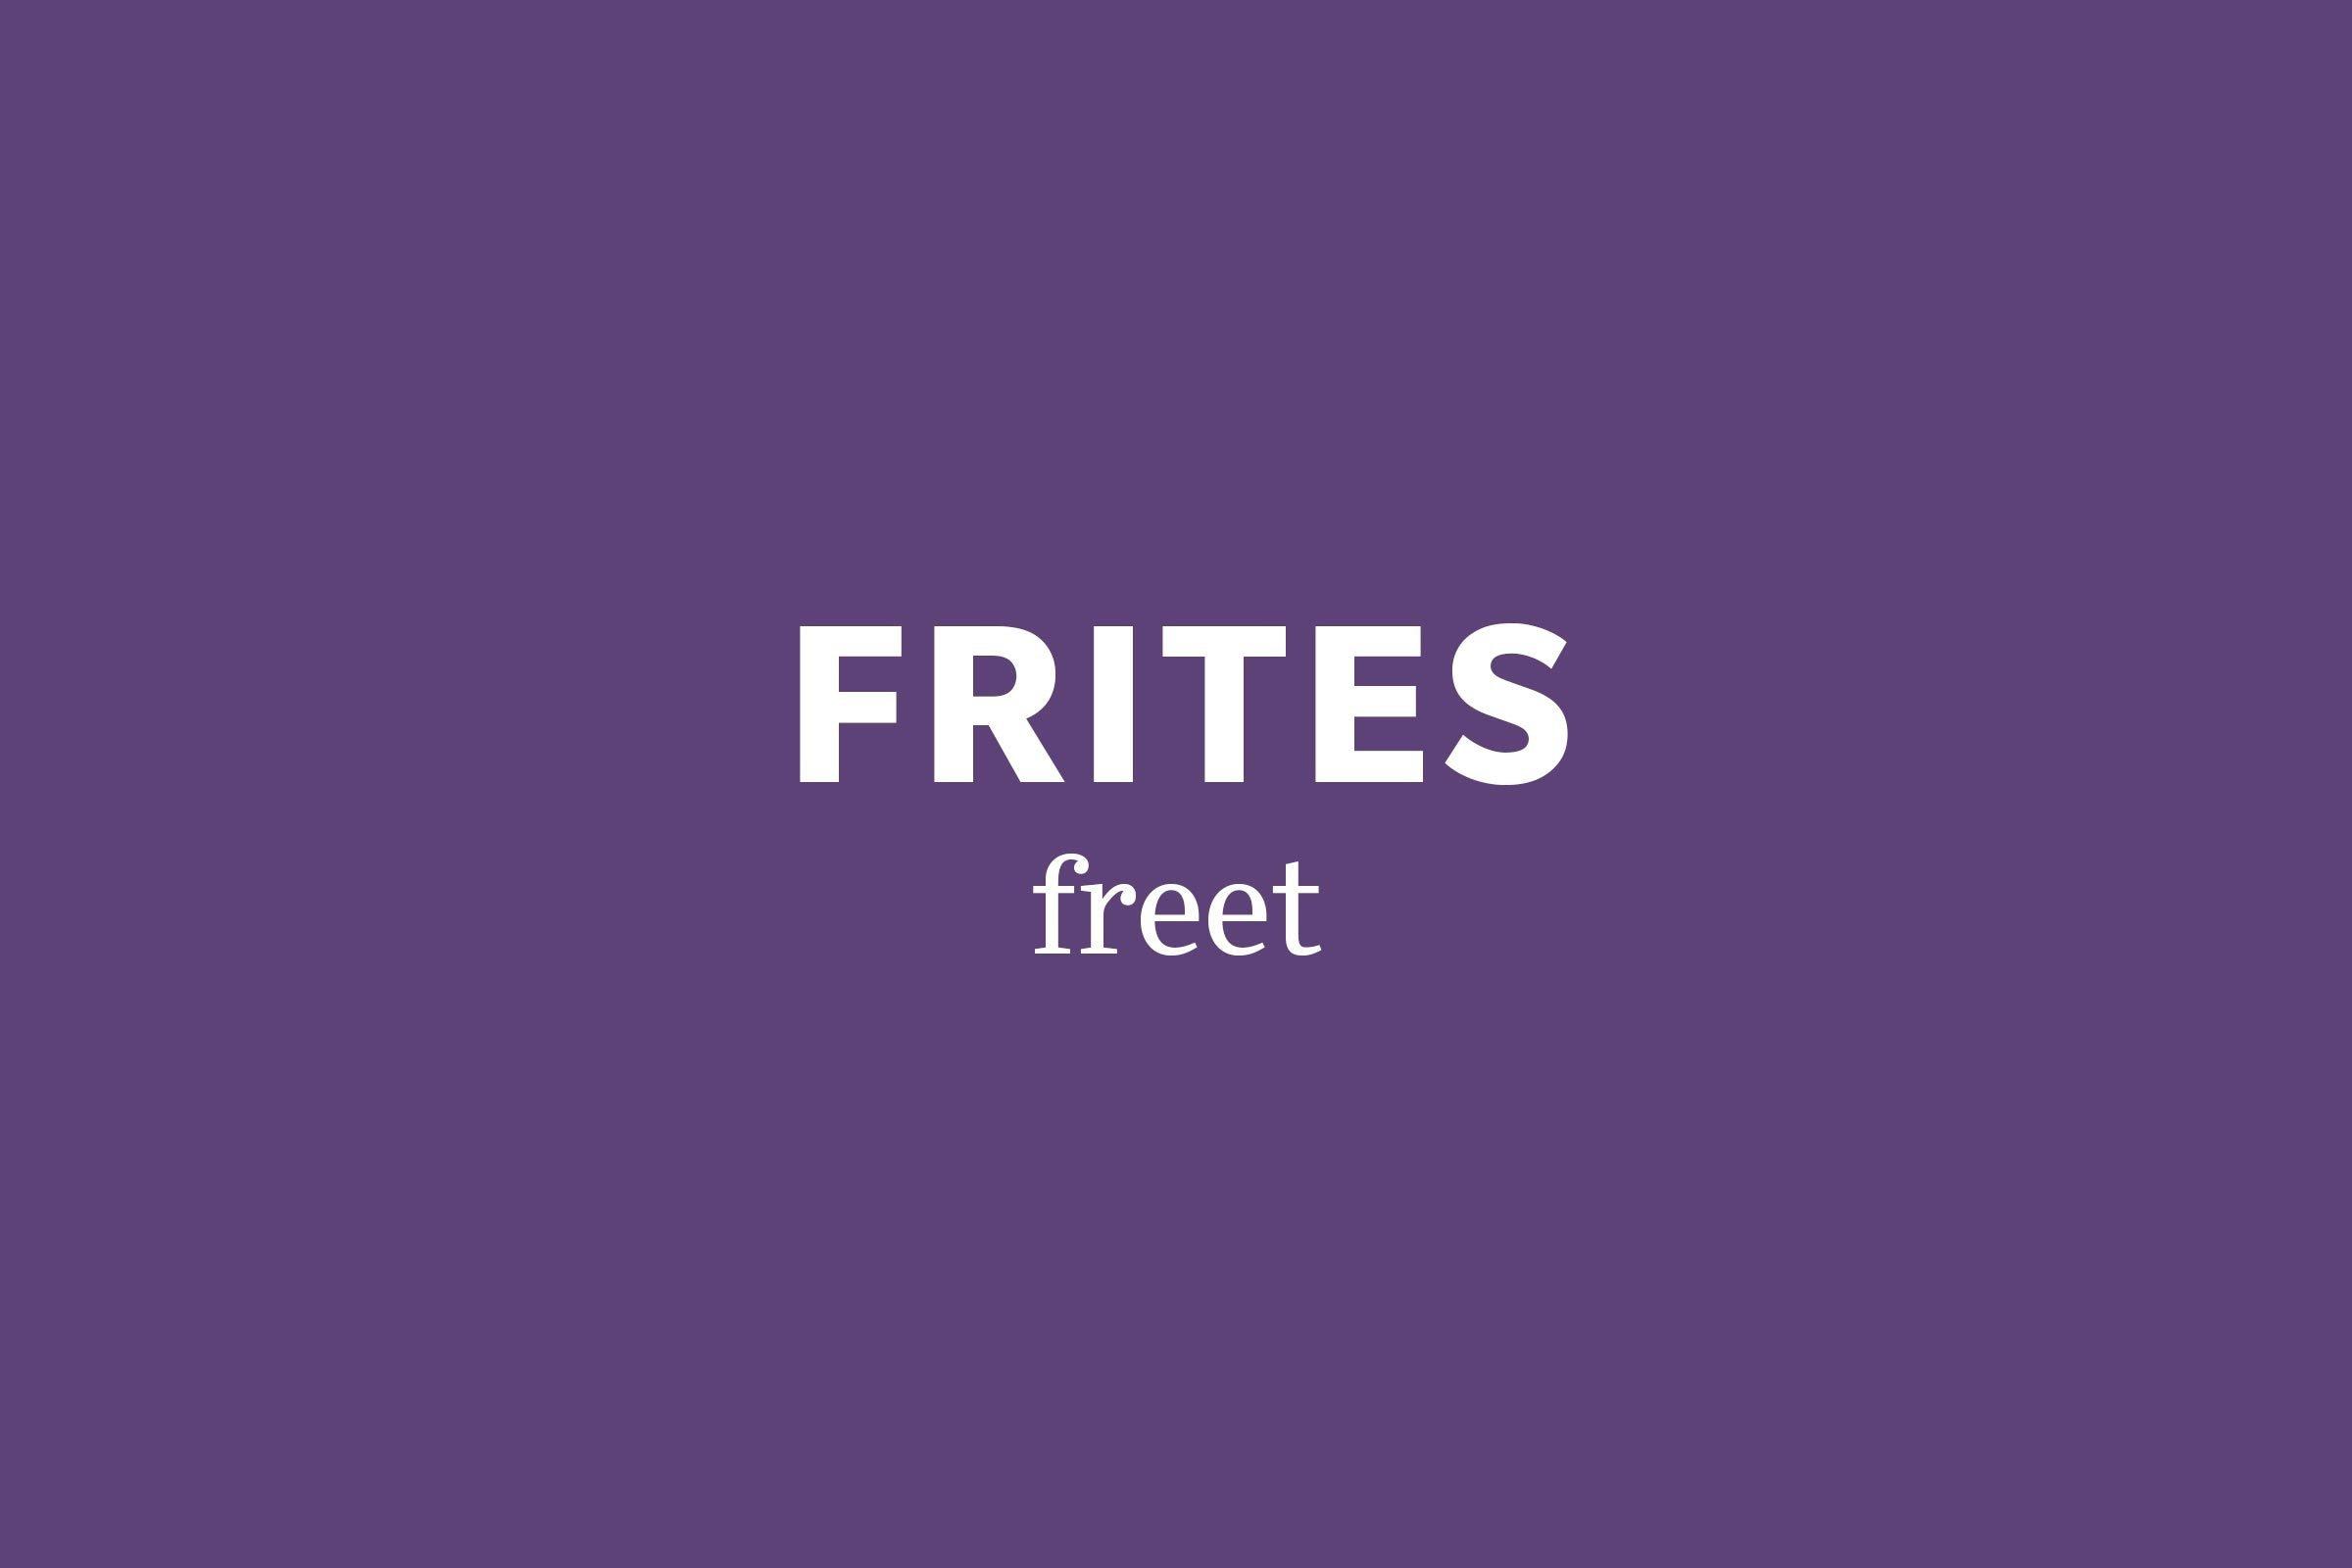 frites pronunciation